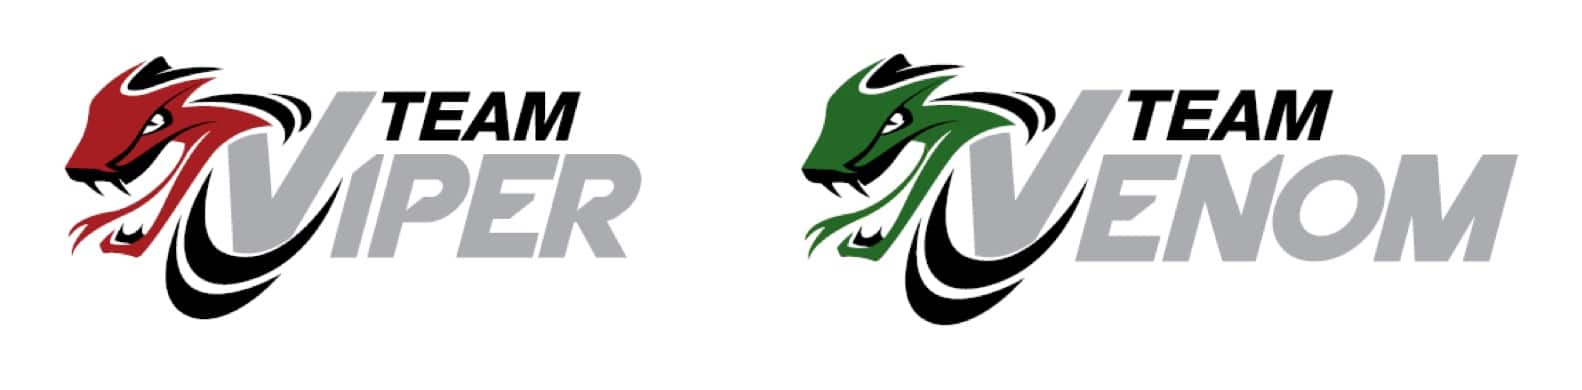 logos-color-horizontales-viper-venom